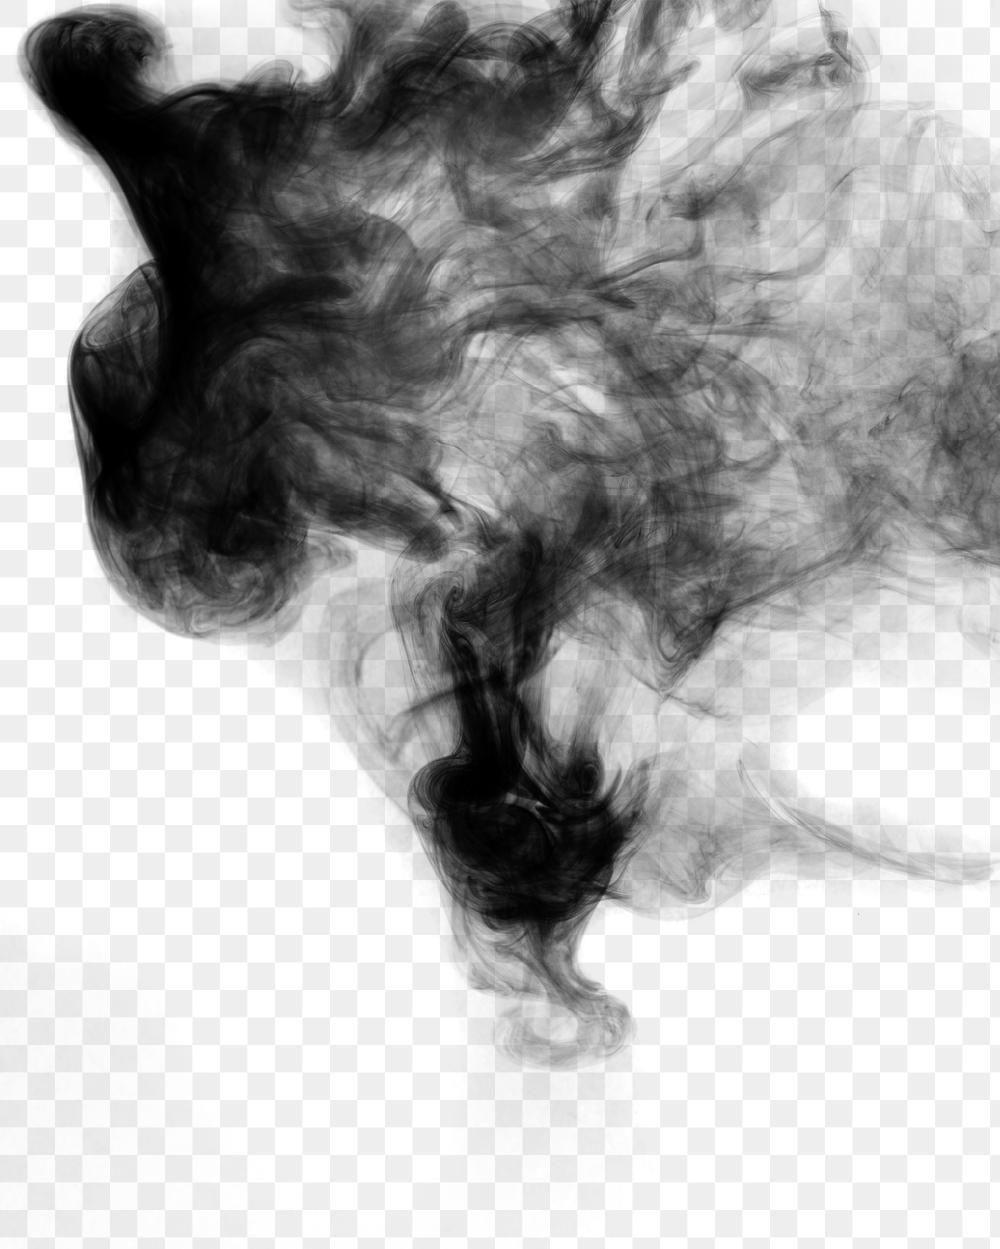 Black Smoke Effect Design Element Free Image By Rawpixel Com Black Smoke Design Element Black Clouds